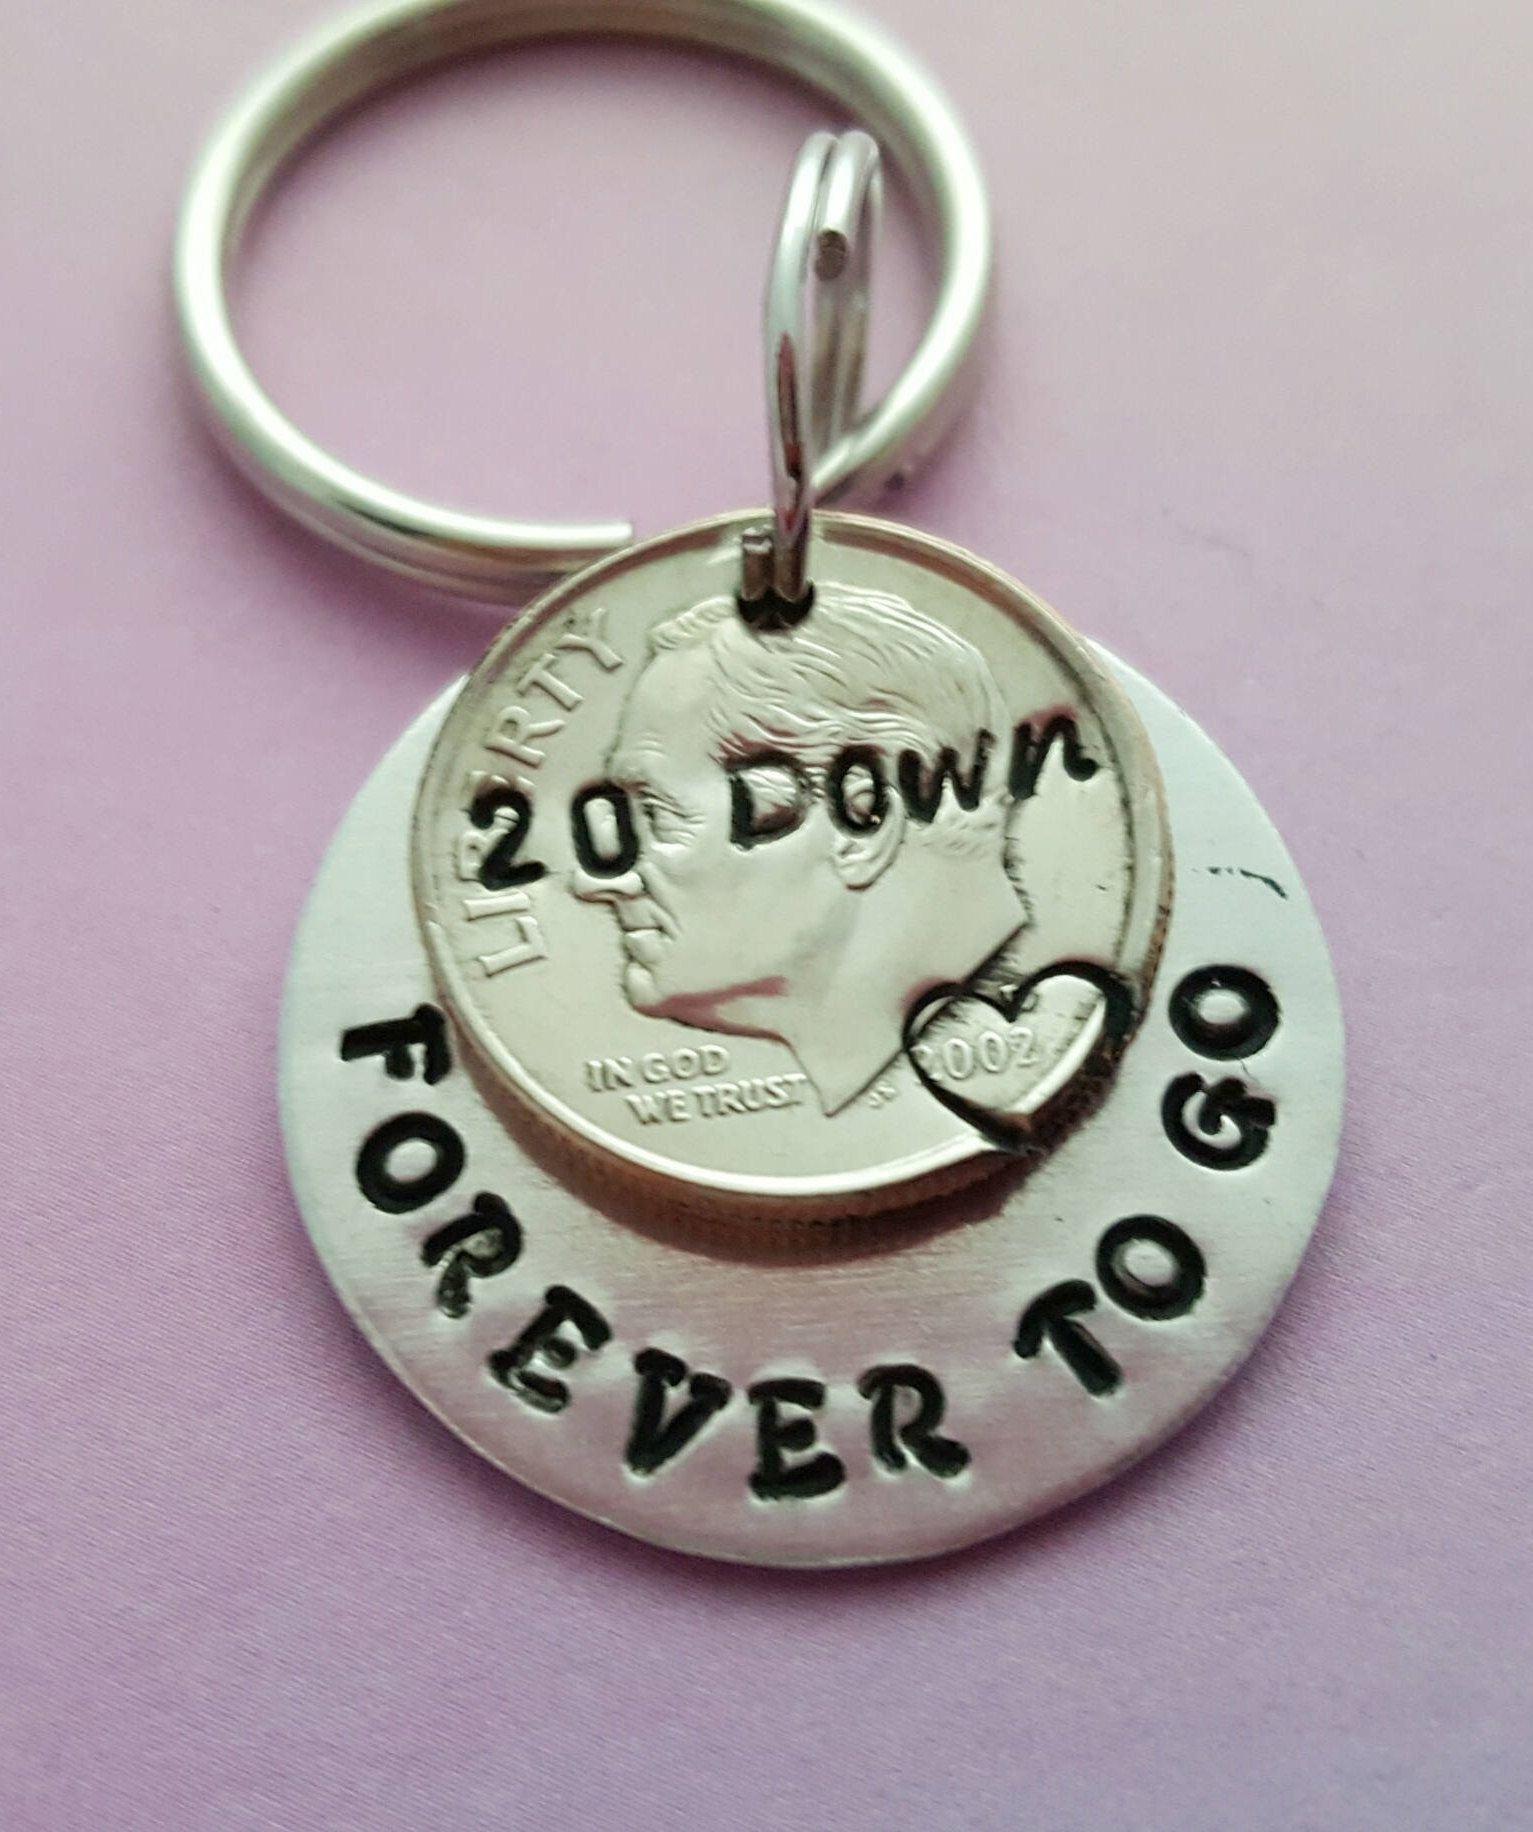 20th anniversary gift idea, 20 year wedding anniversary keychain